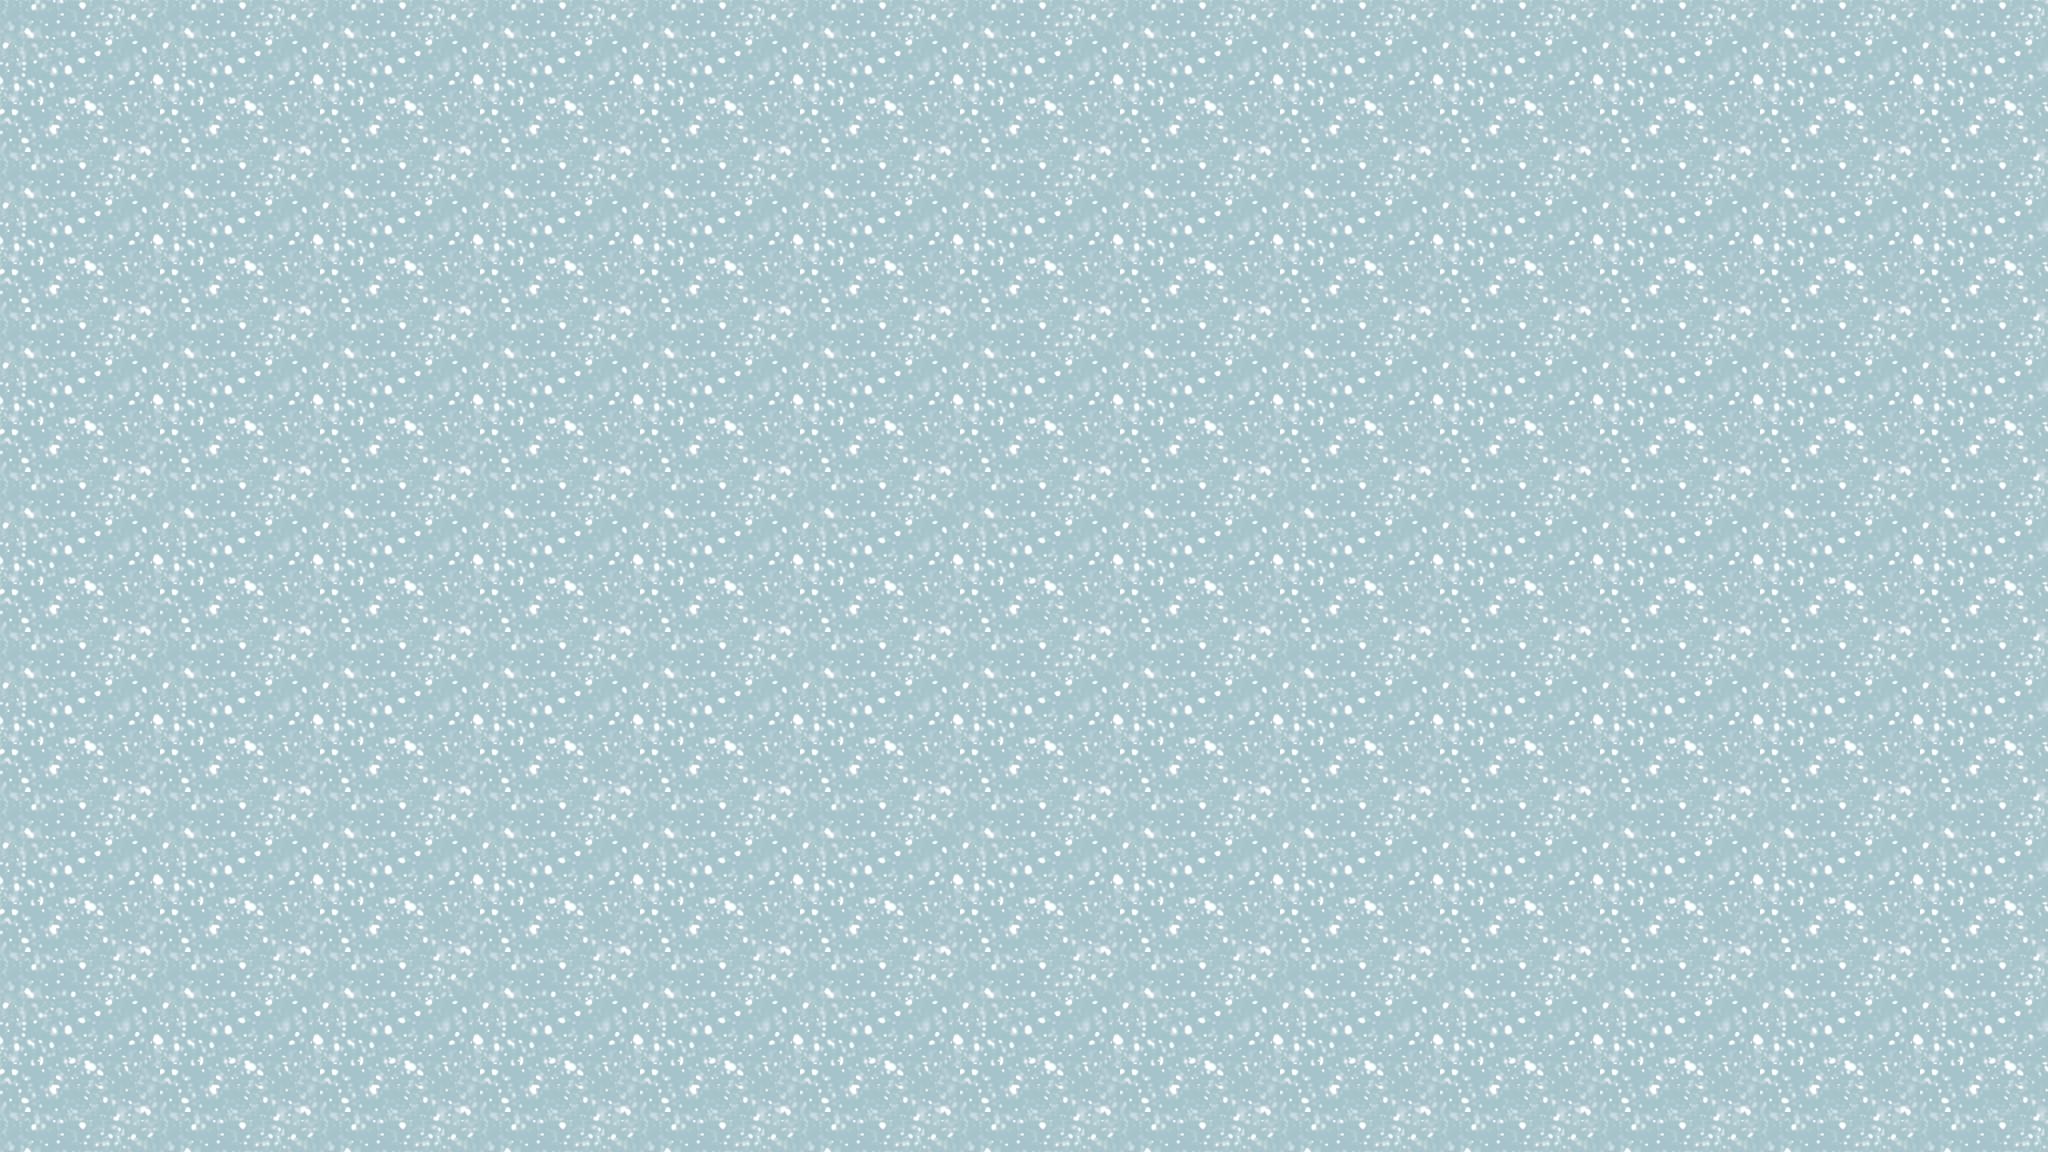 snow desktop backgrounds wallpaper